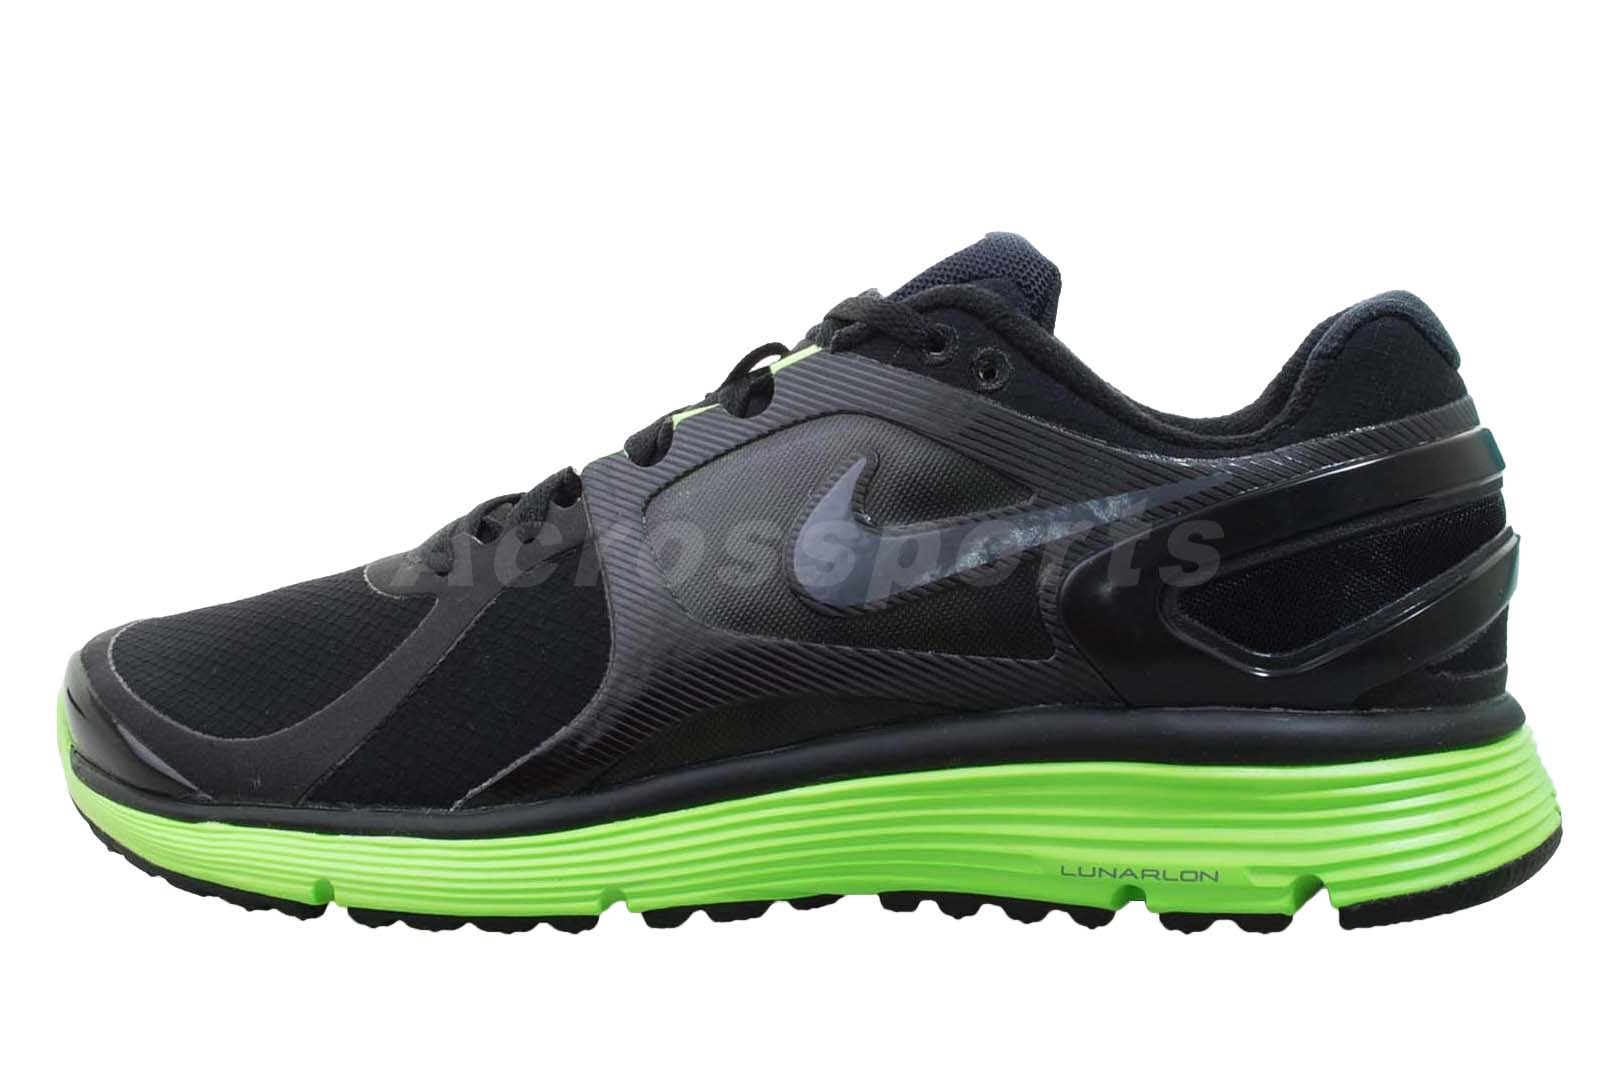 Kitchen Faucet Brand Logos Nike Lunarlon Running Shoes 28 Images Nike Wmns